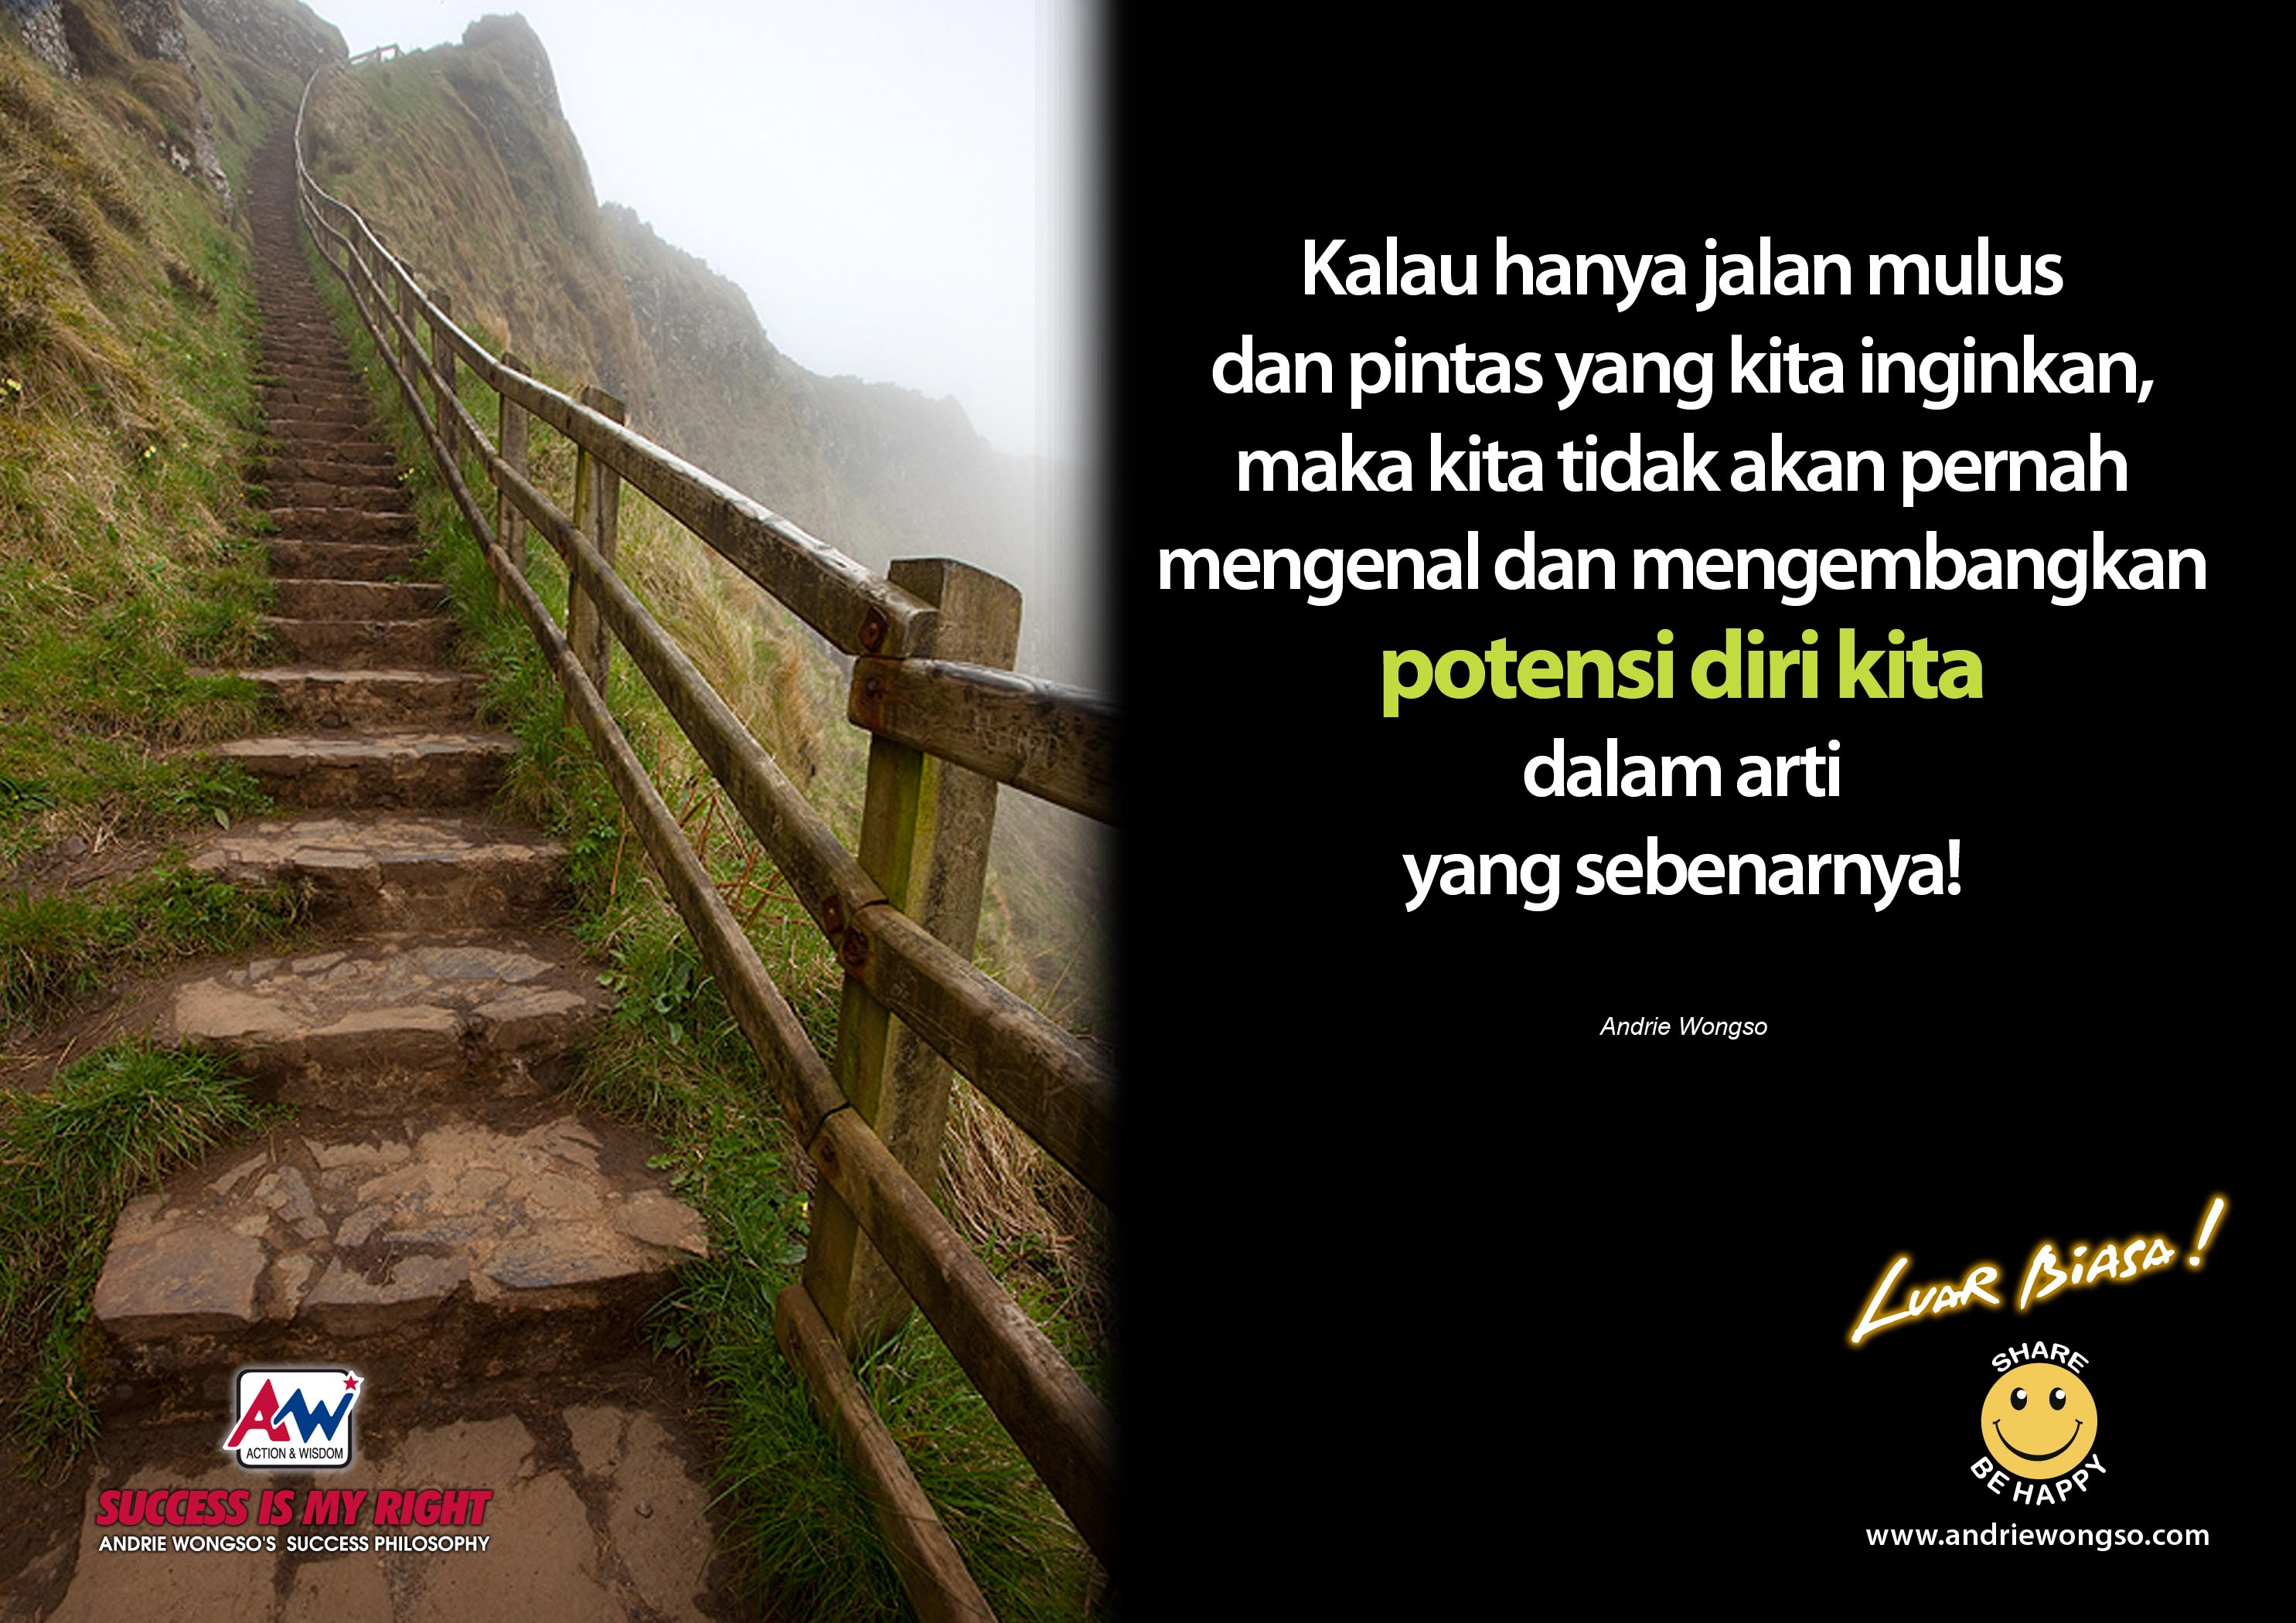 Poster Motivasi \u0026 Inspirasi  Nasyid Semarang, Grup Nasyid Semarang, Group Nasyid Semarang, Grup